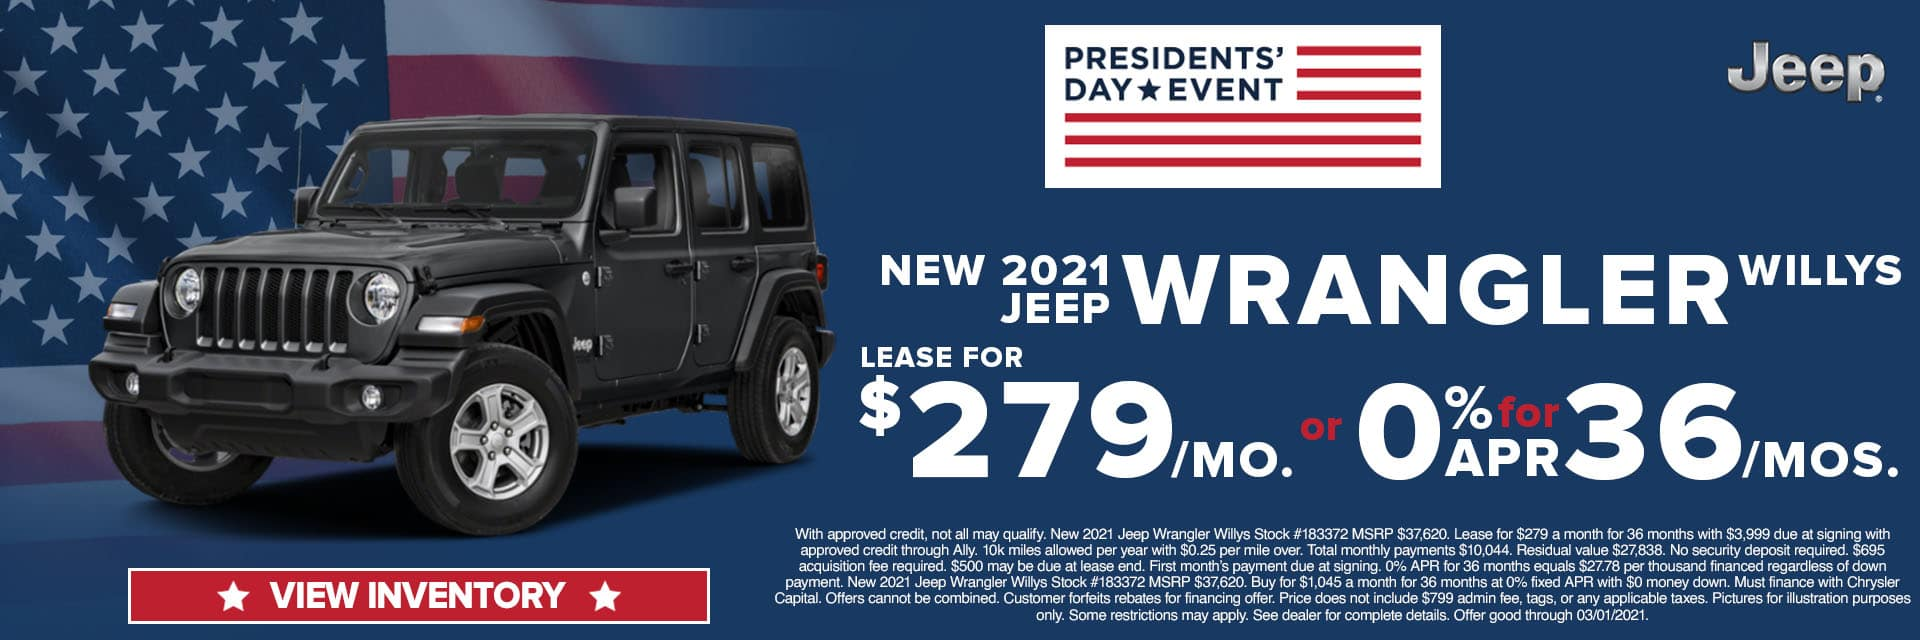 CLCP-February 2021-2021 Jeep Wrangler